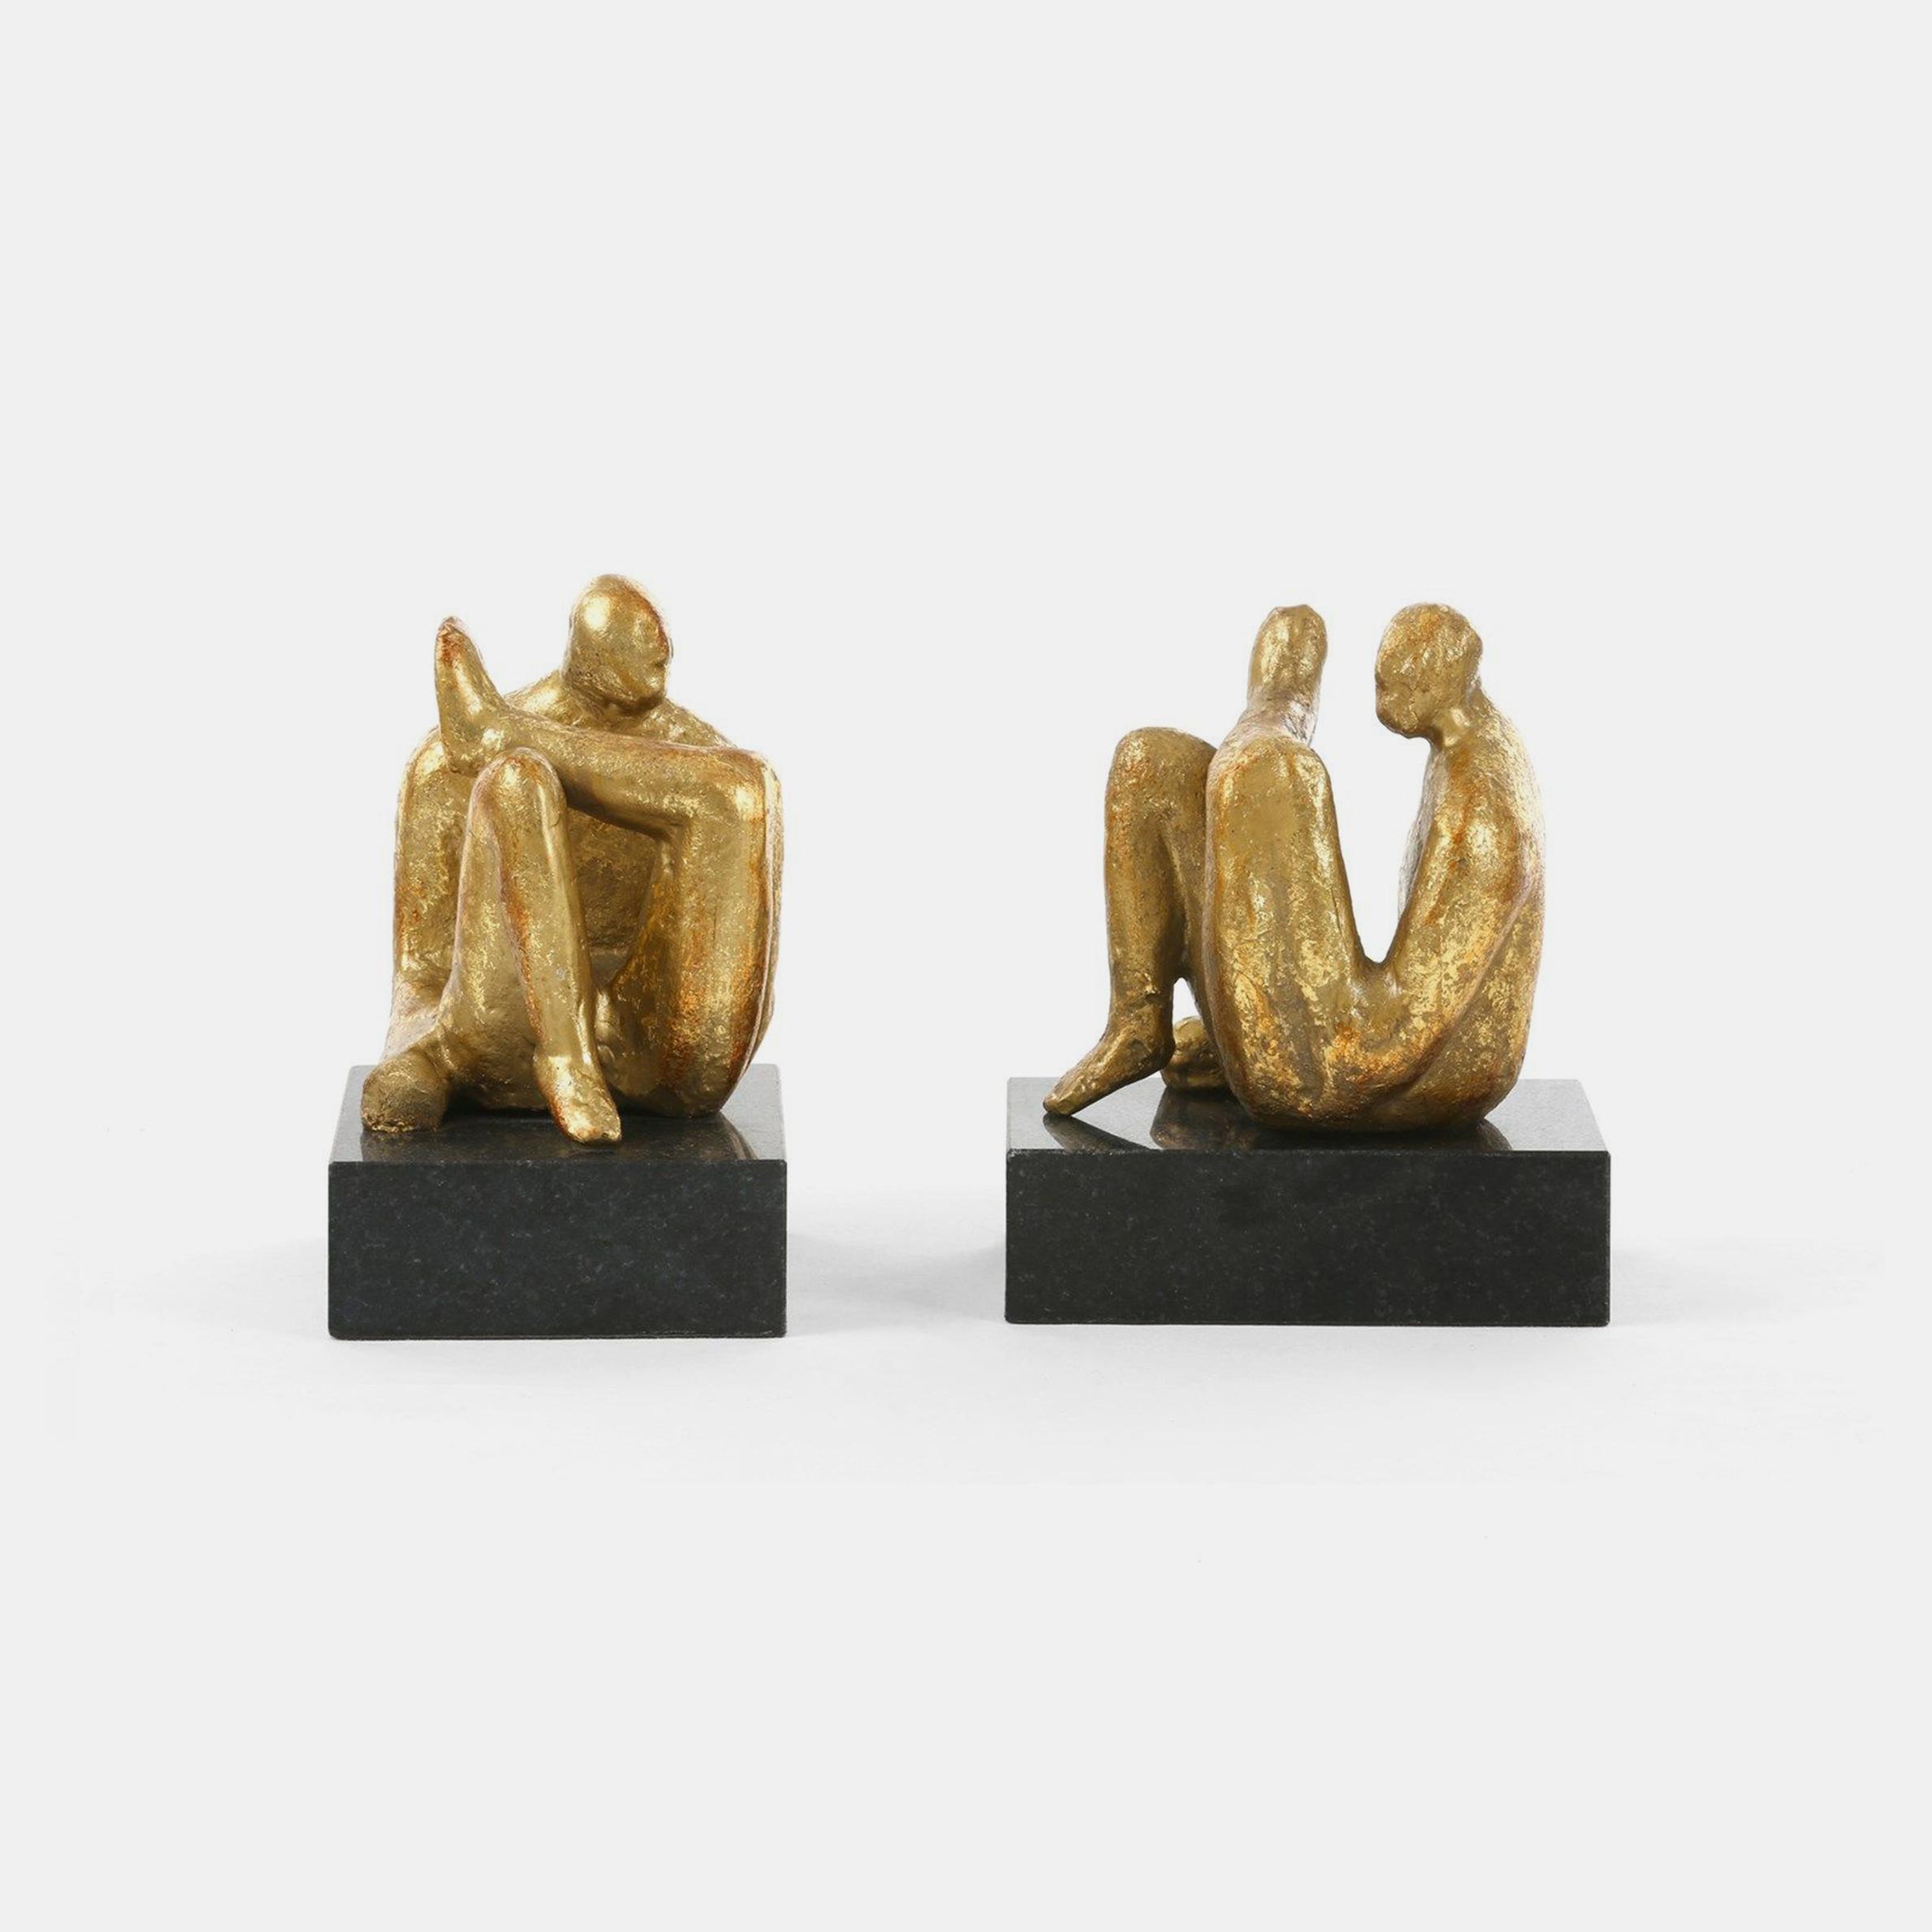 Gold Sitting Statue  Gold leafed iron on black marble base. 5.5w x 4.5d x 6h. SKU7785BGW